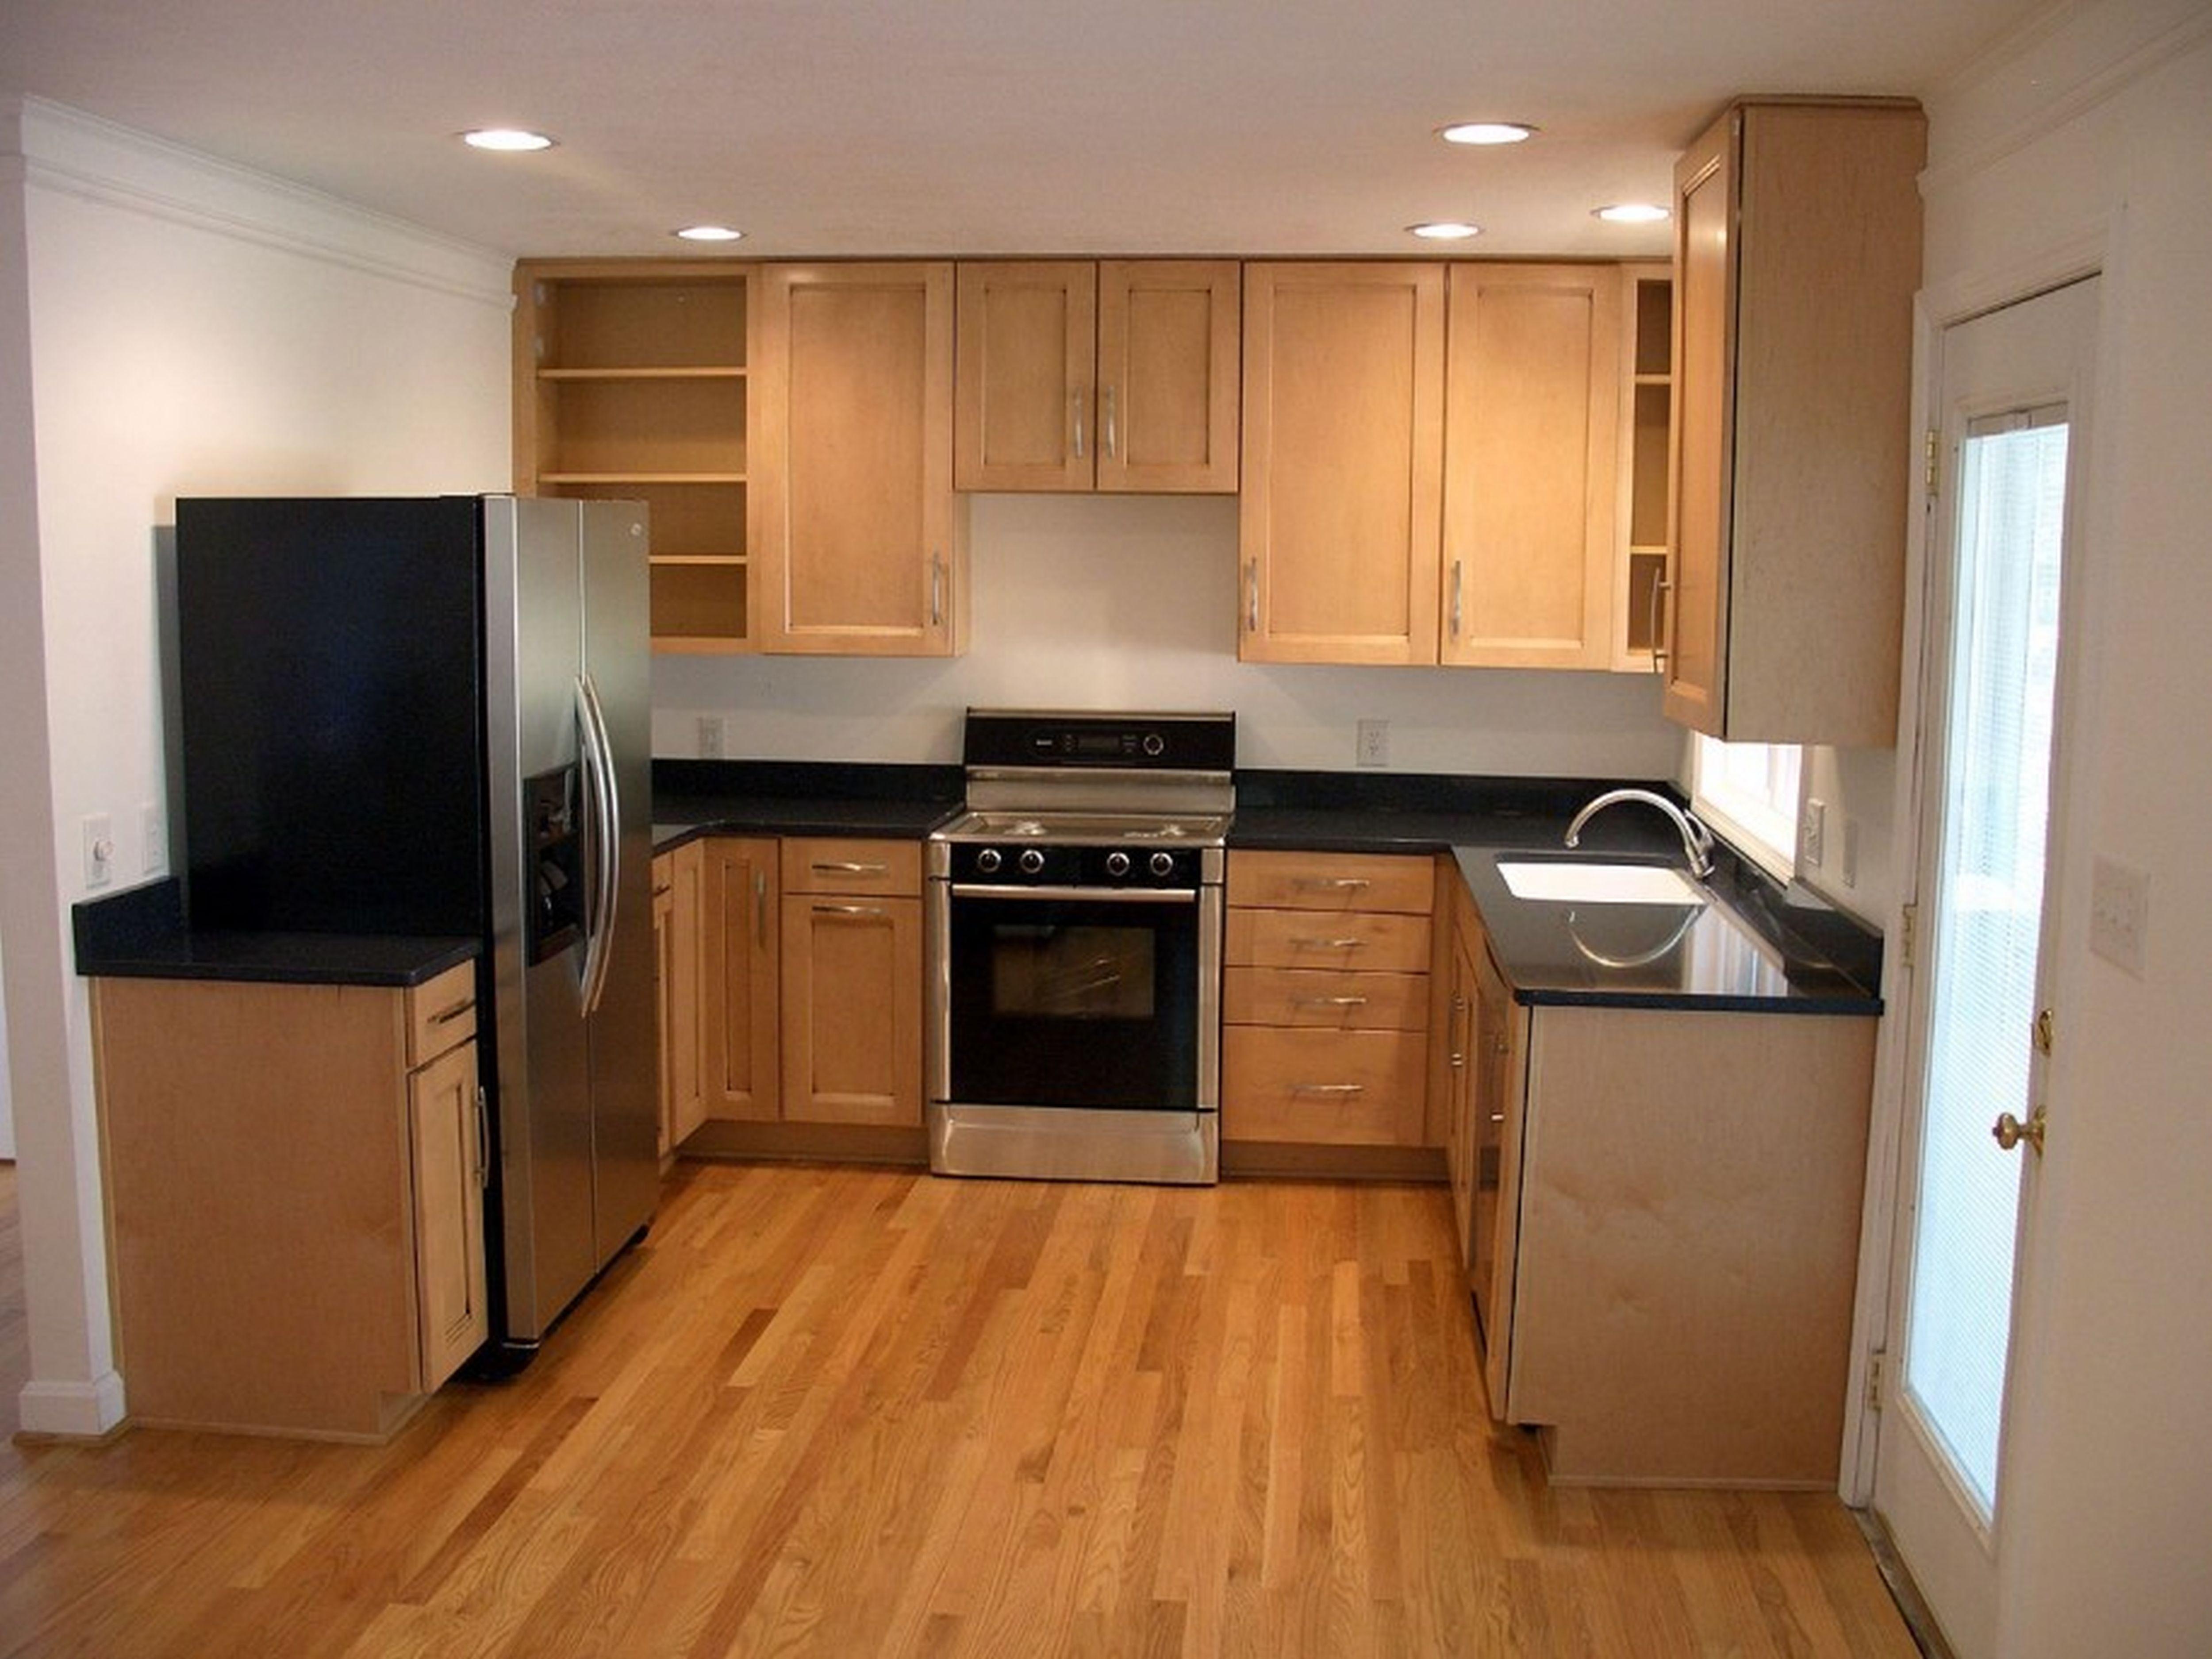 u shaped kitchen cabinets photos photo - 6